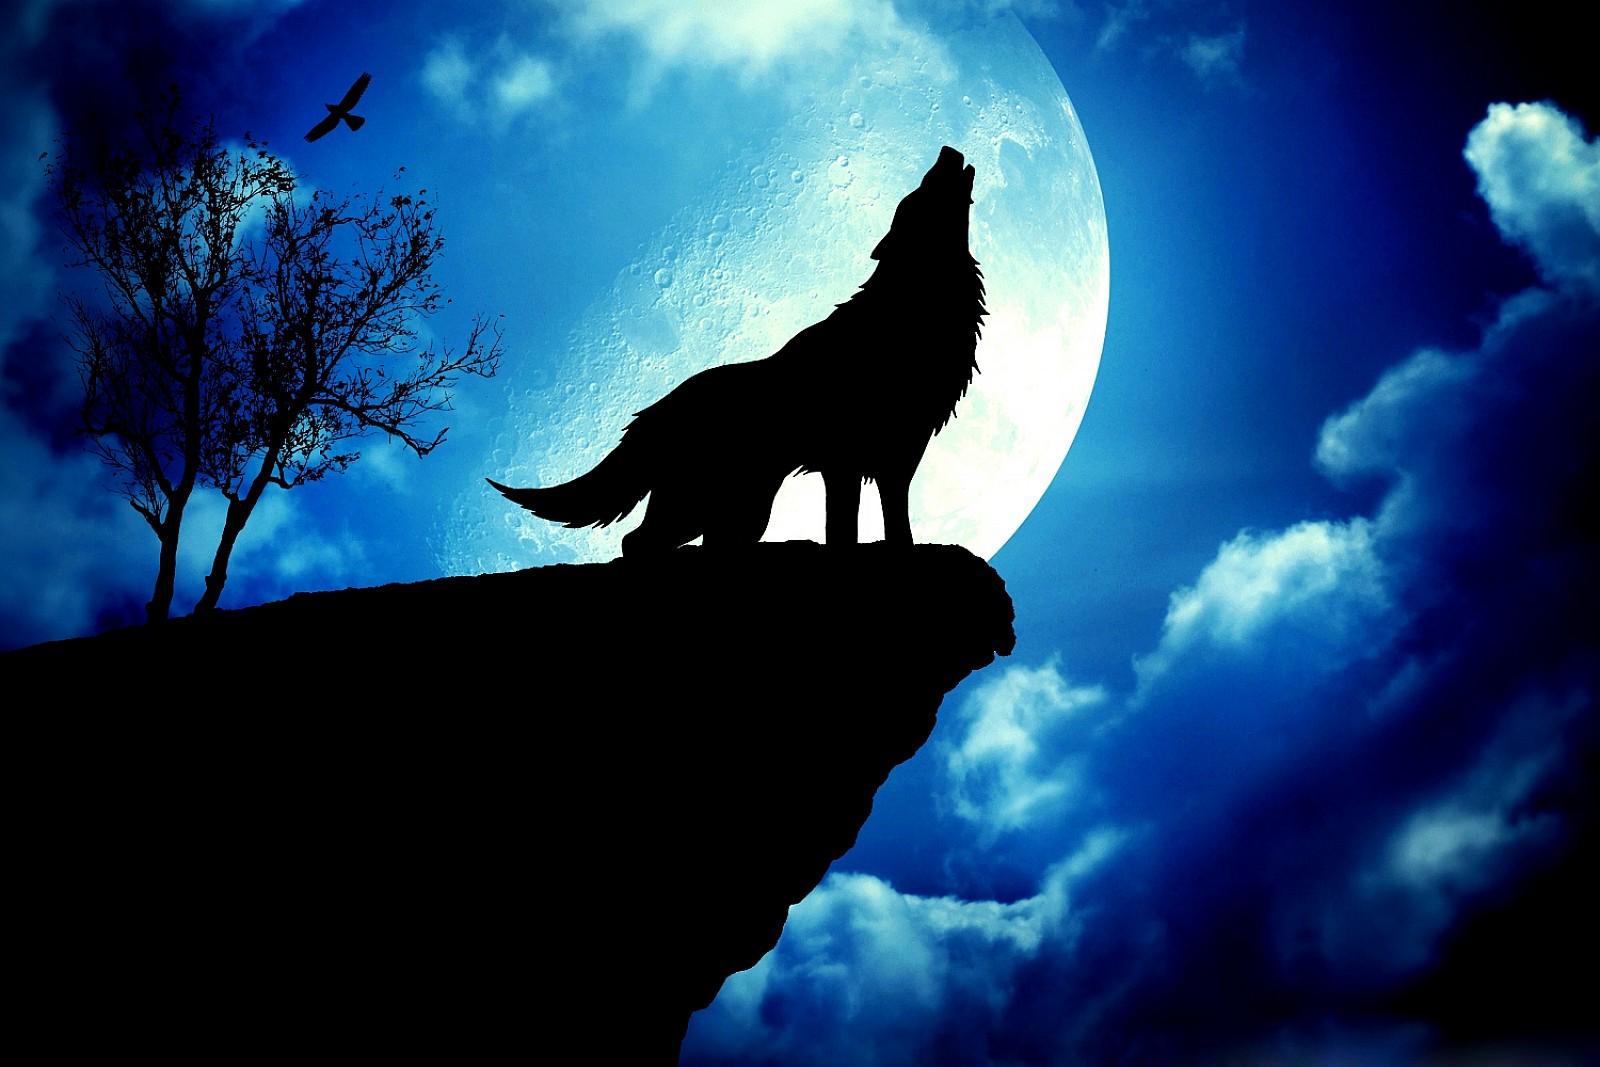 blue moon wolf wallpaper - photo #4